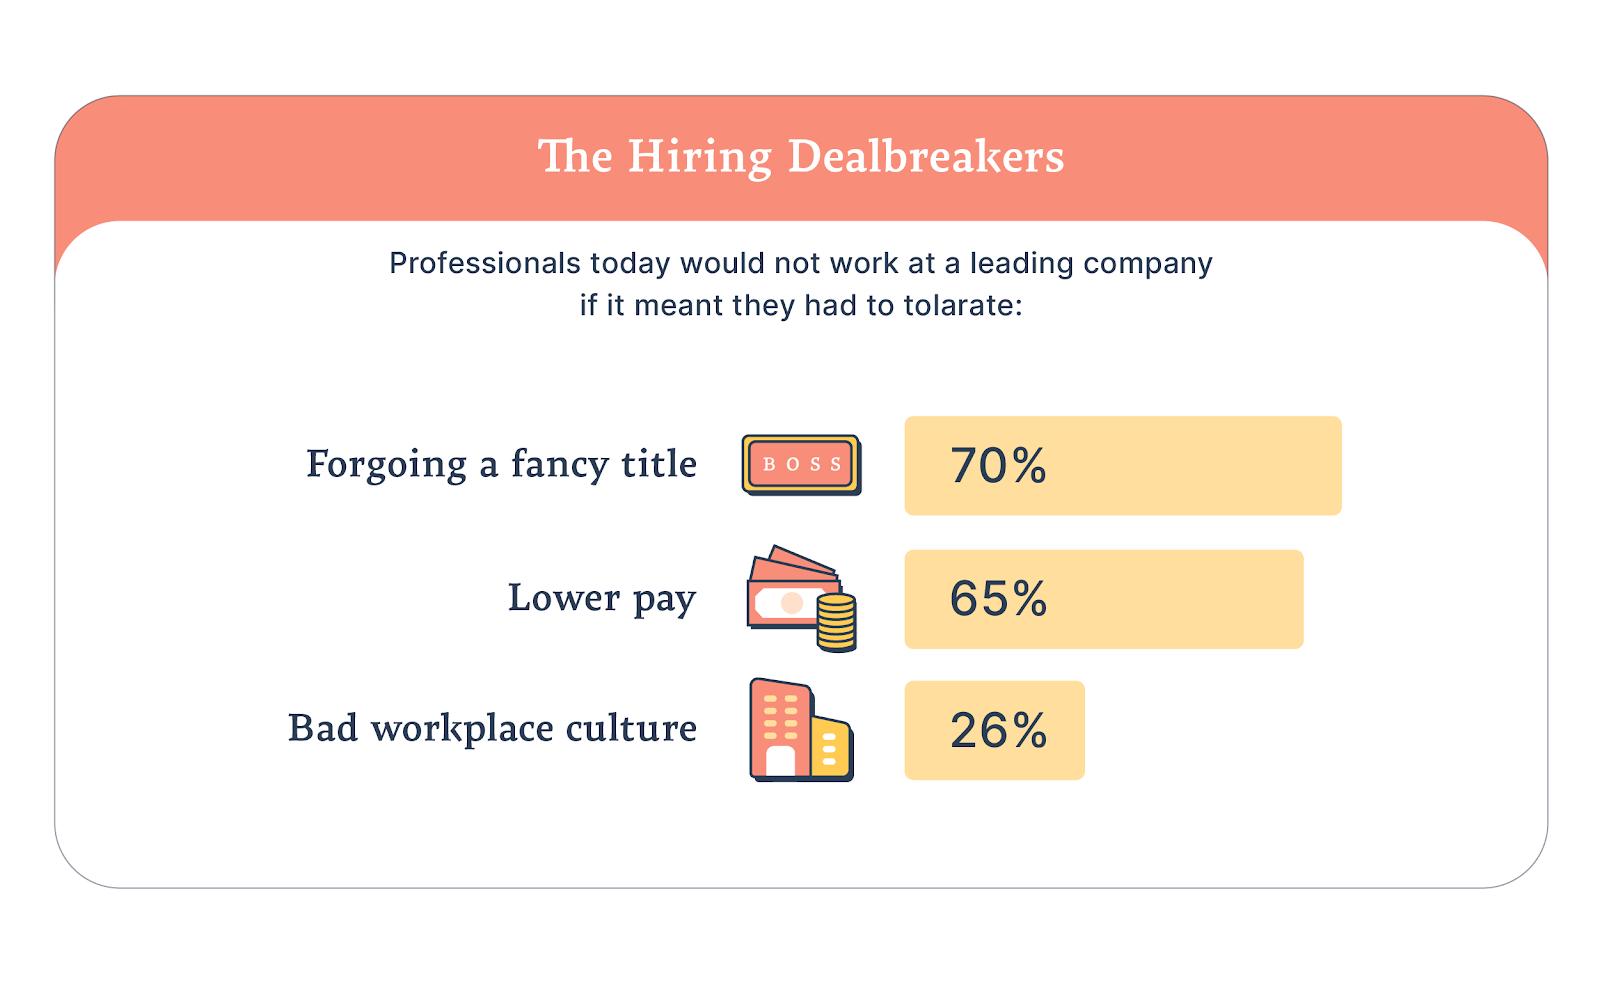 Statistics about hiring dealbreakers